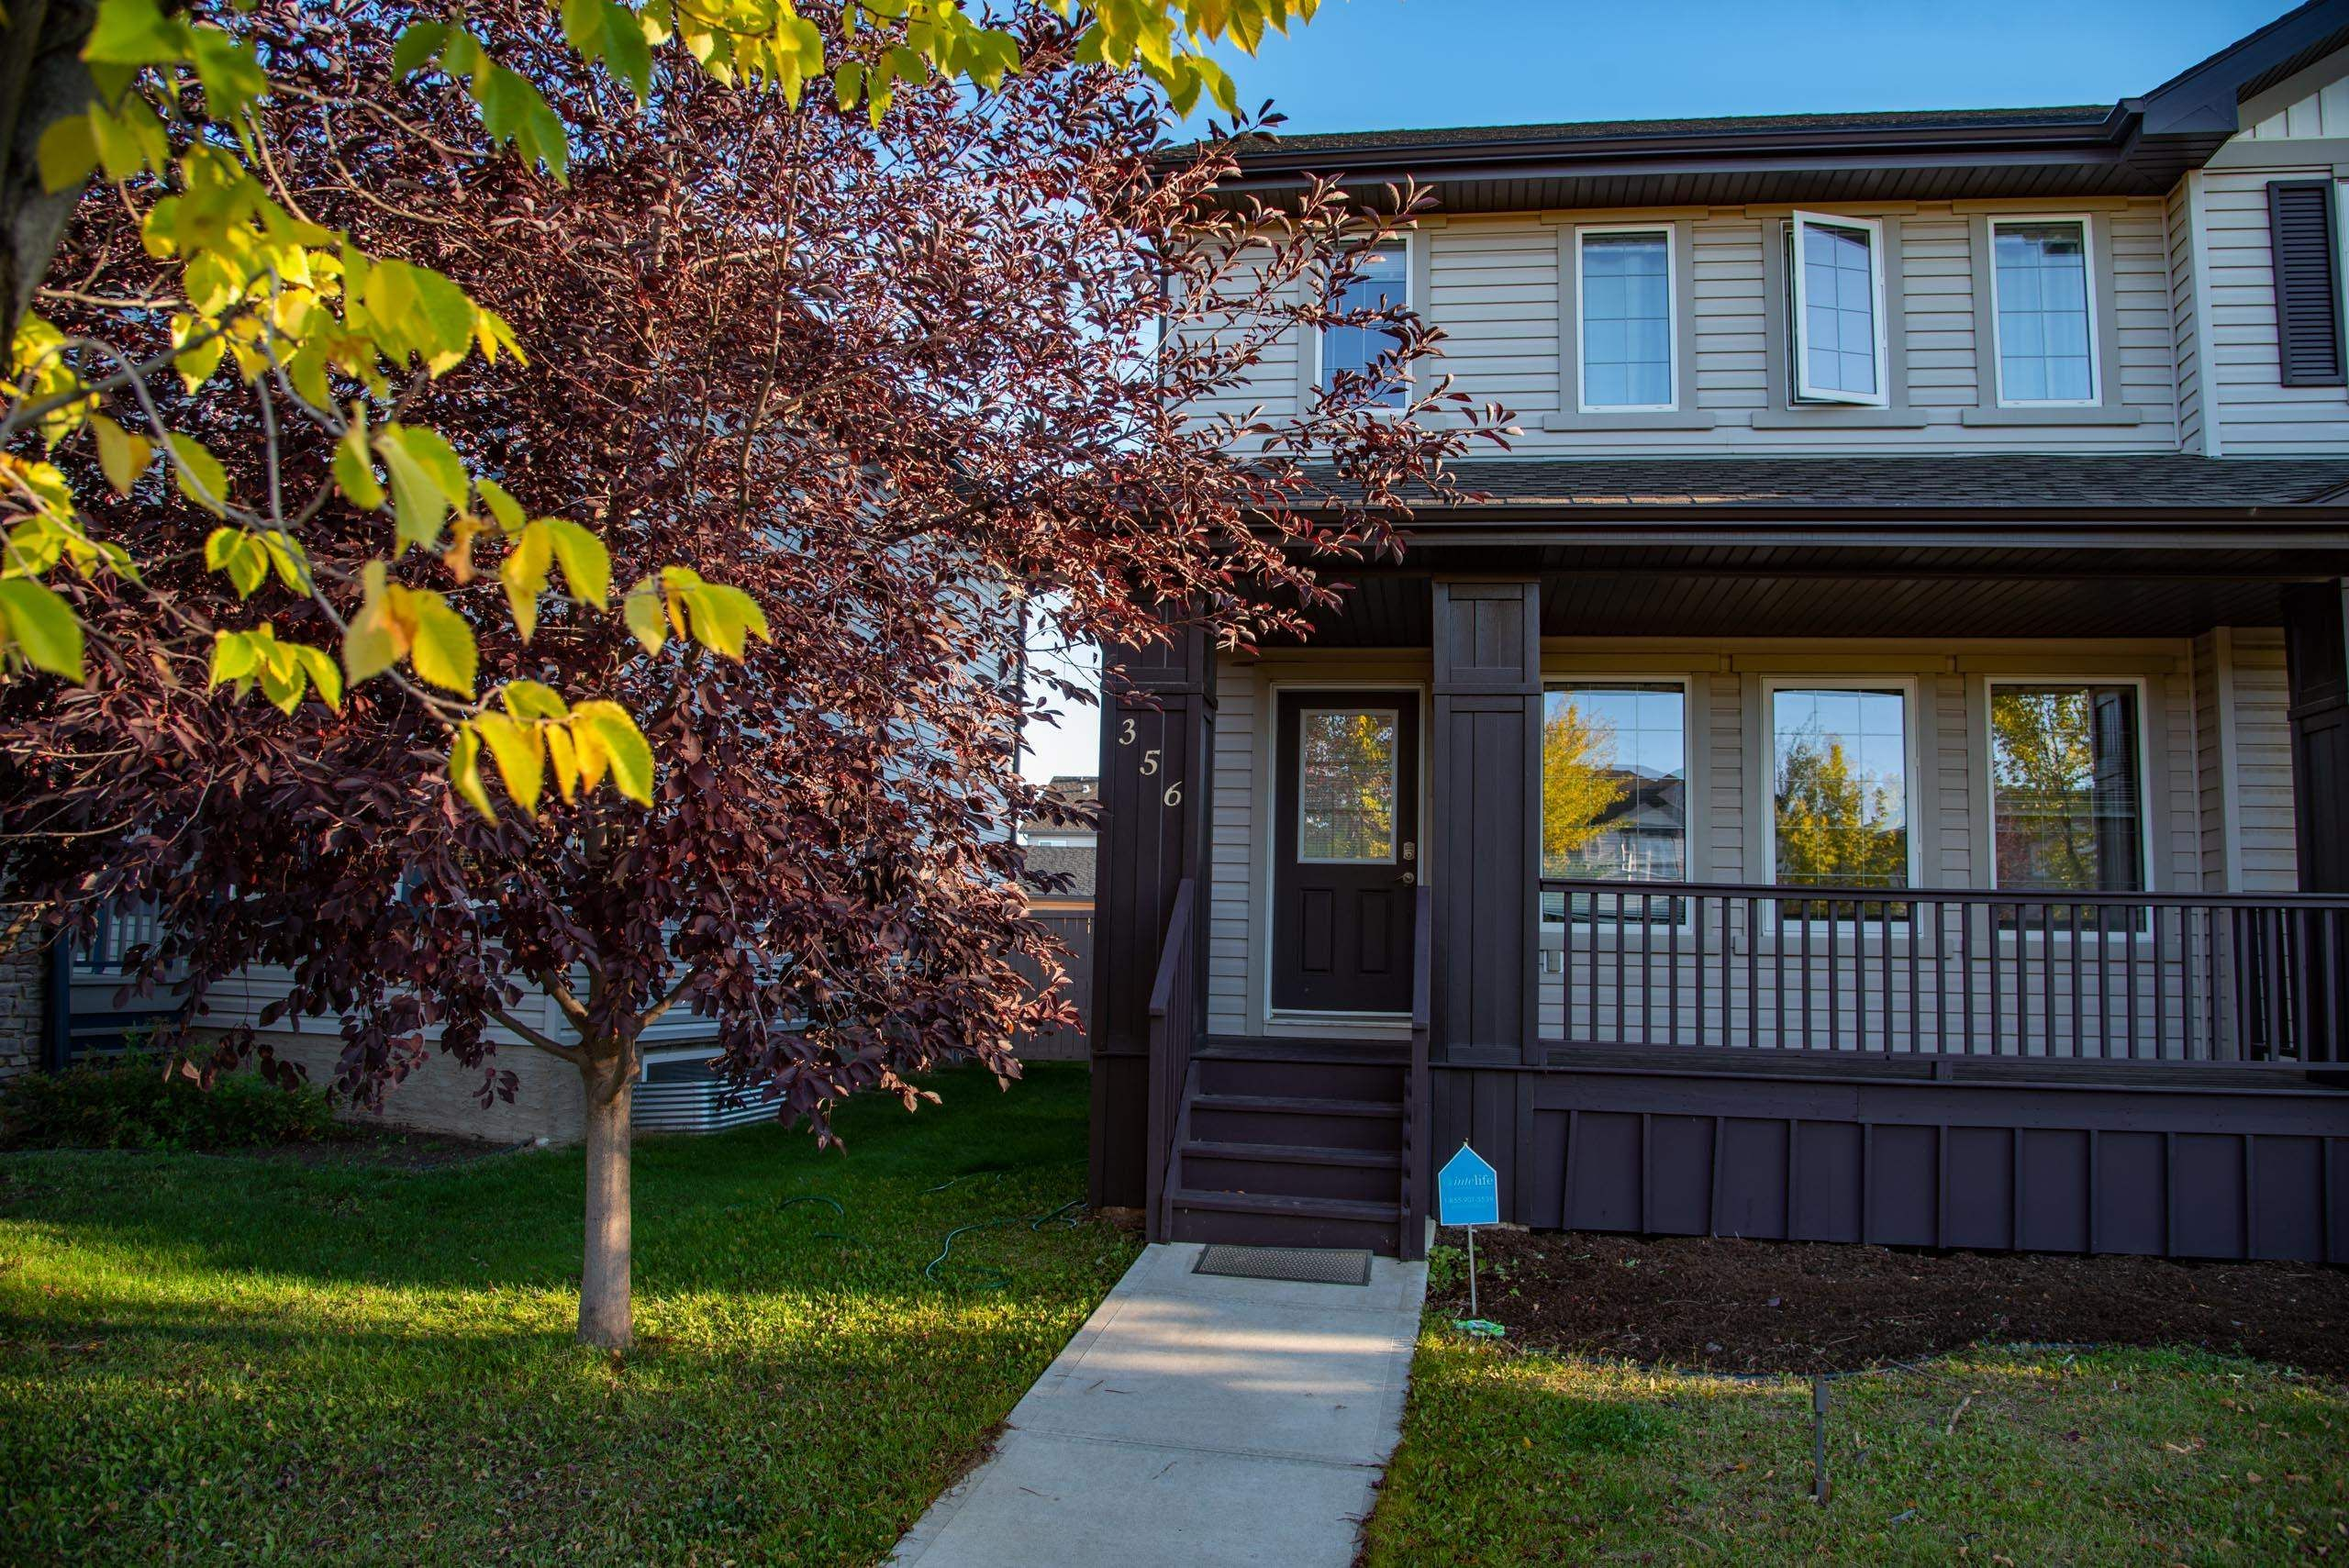 Main Photo: 356 SECORD Boulevard in Edmonton: Zone 58 House Half Duplex for sale : MLS®# E4263489